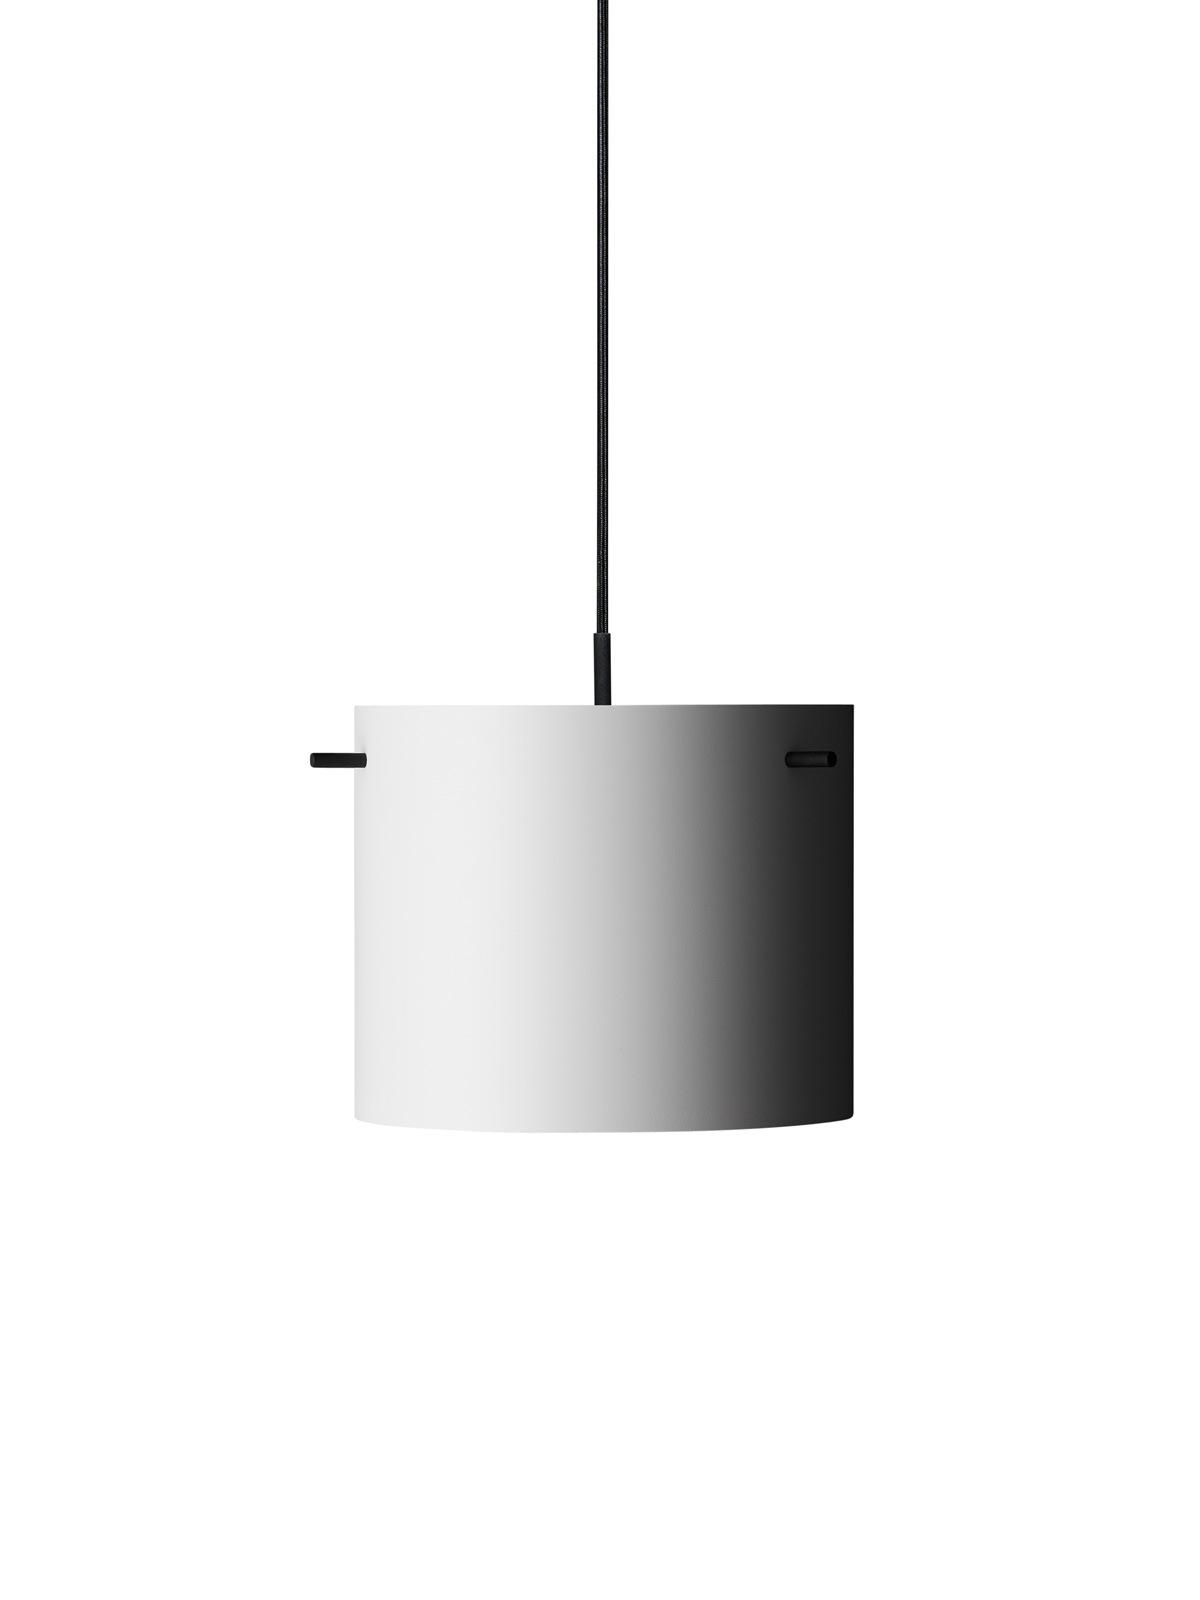 FM 1954 Pendant Frandsen Pendelleuchte DesignOrt Lampen Onlineshop Berlin